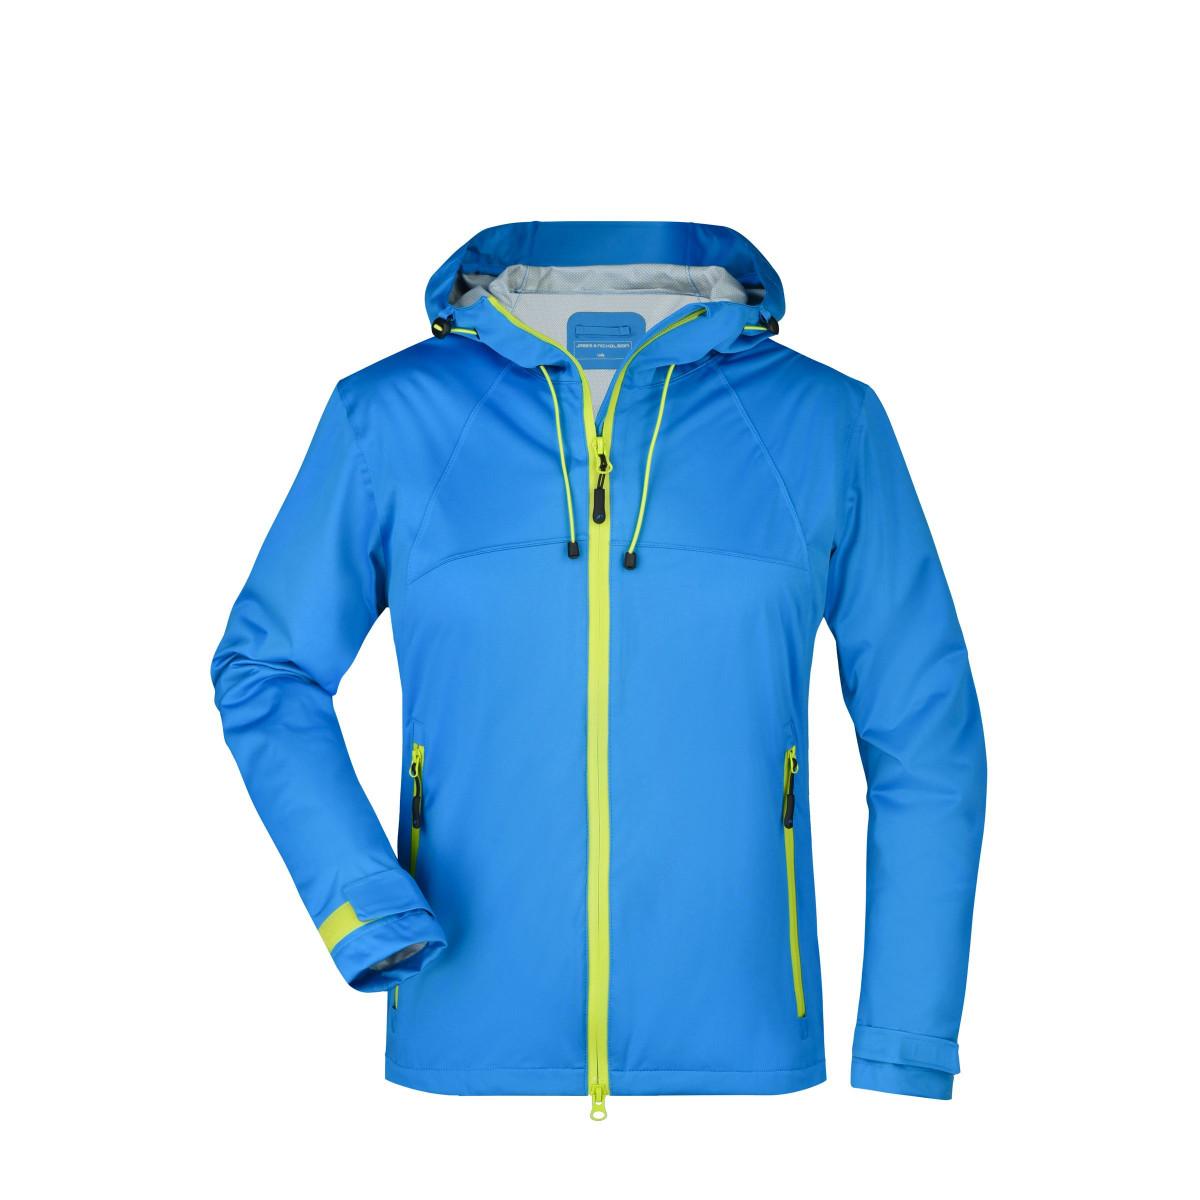 Куртка женская JN1097 Ladies Outdoor Jacket - Аква/Ярко-желтый